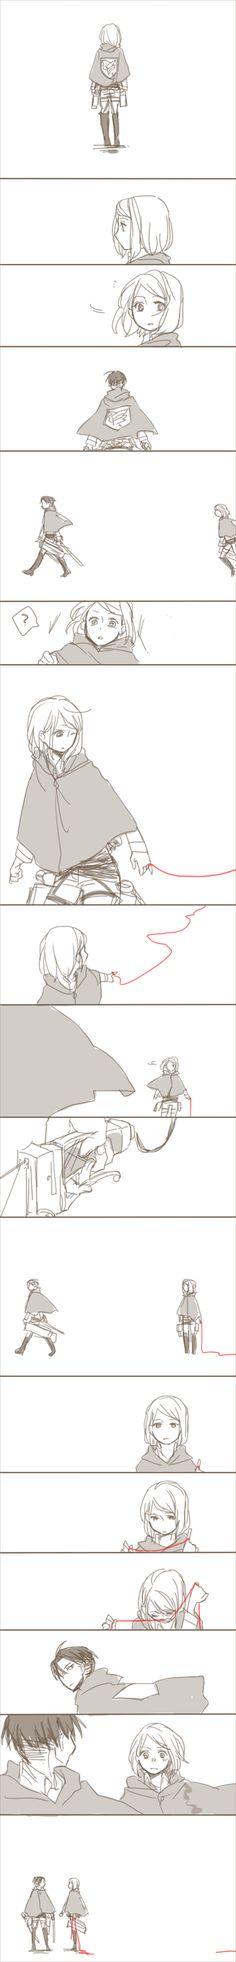 Attack on Titan/Shingeki no Kyojin - Levi and Petra----- I totally ship it!